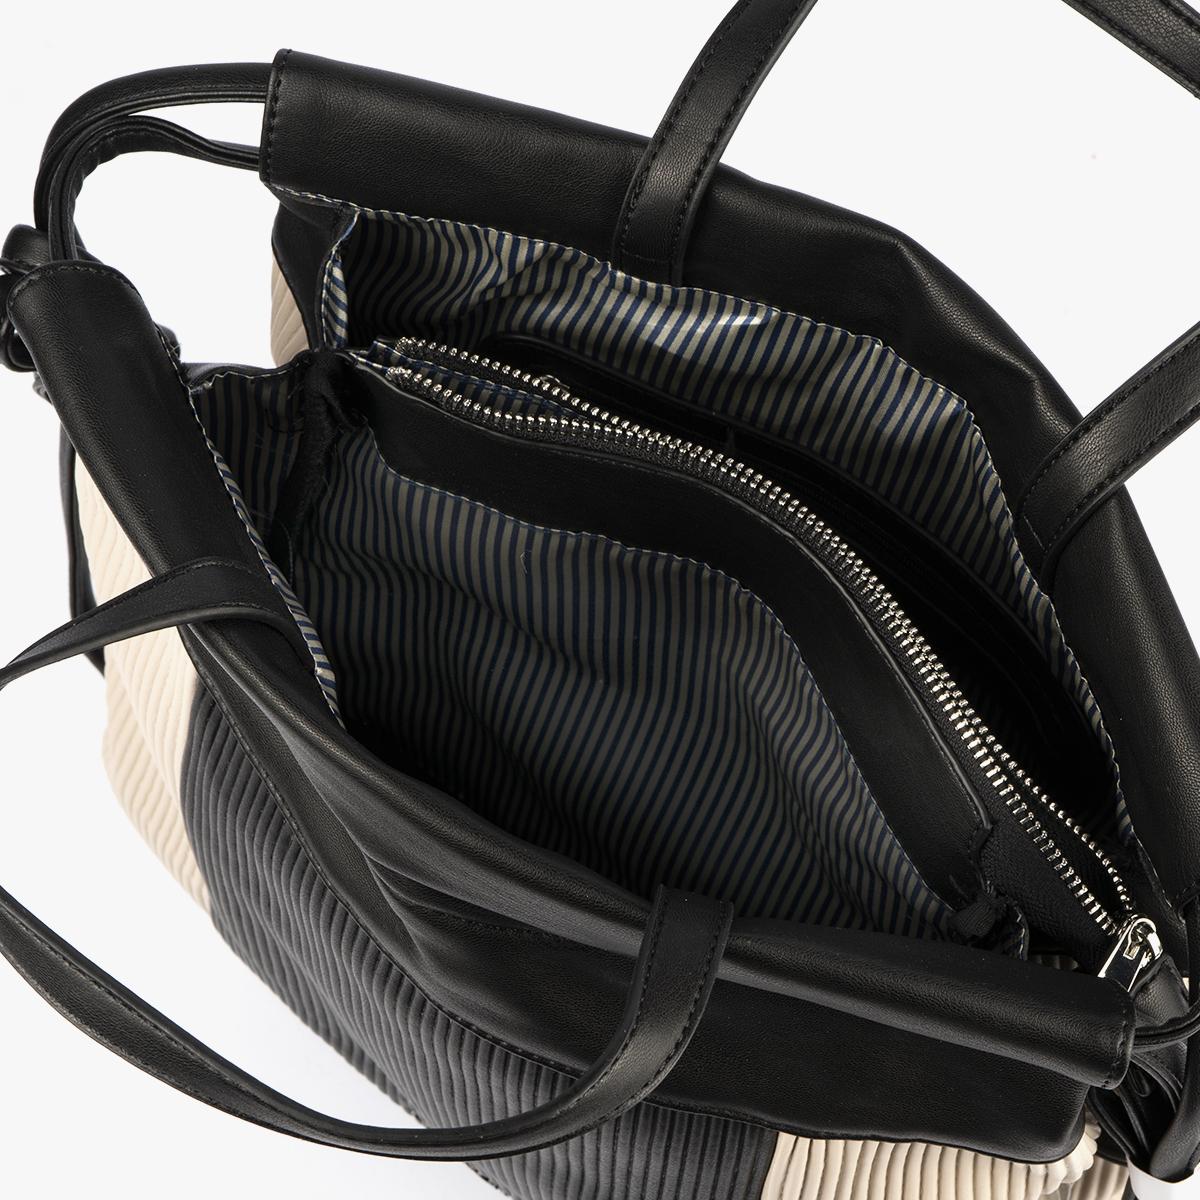 44120 bolso de mochila dorado/negro pepemoll